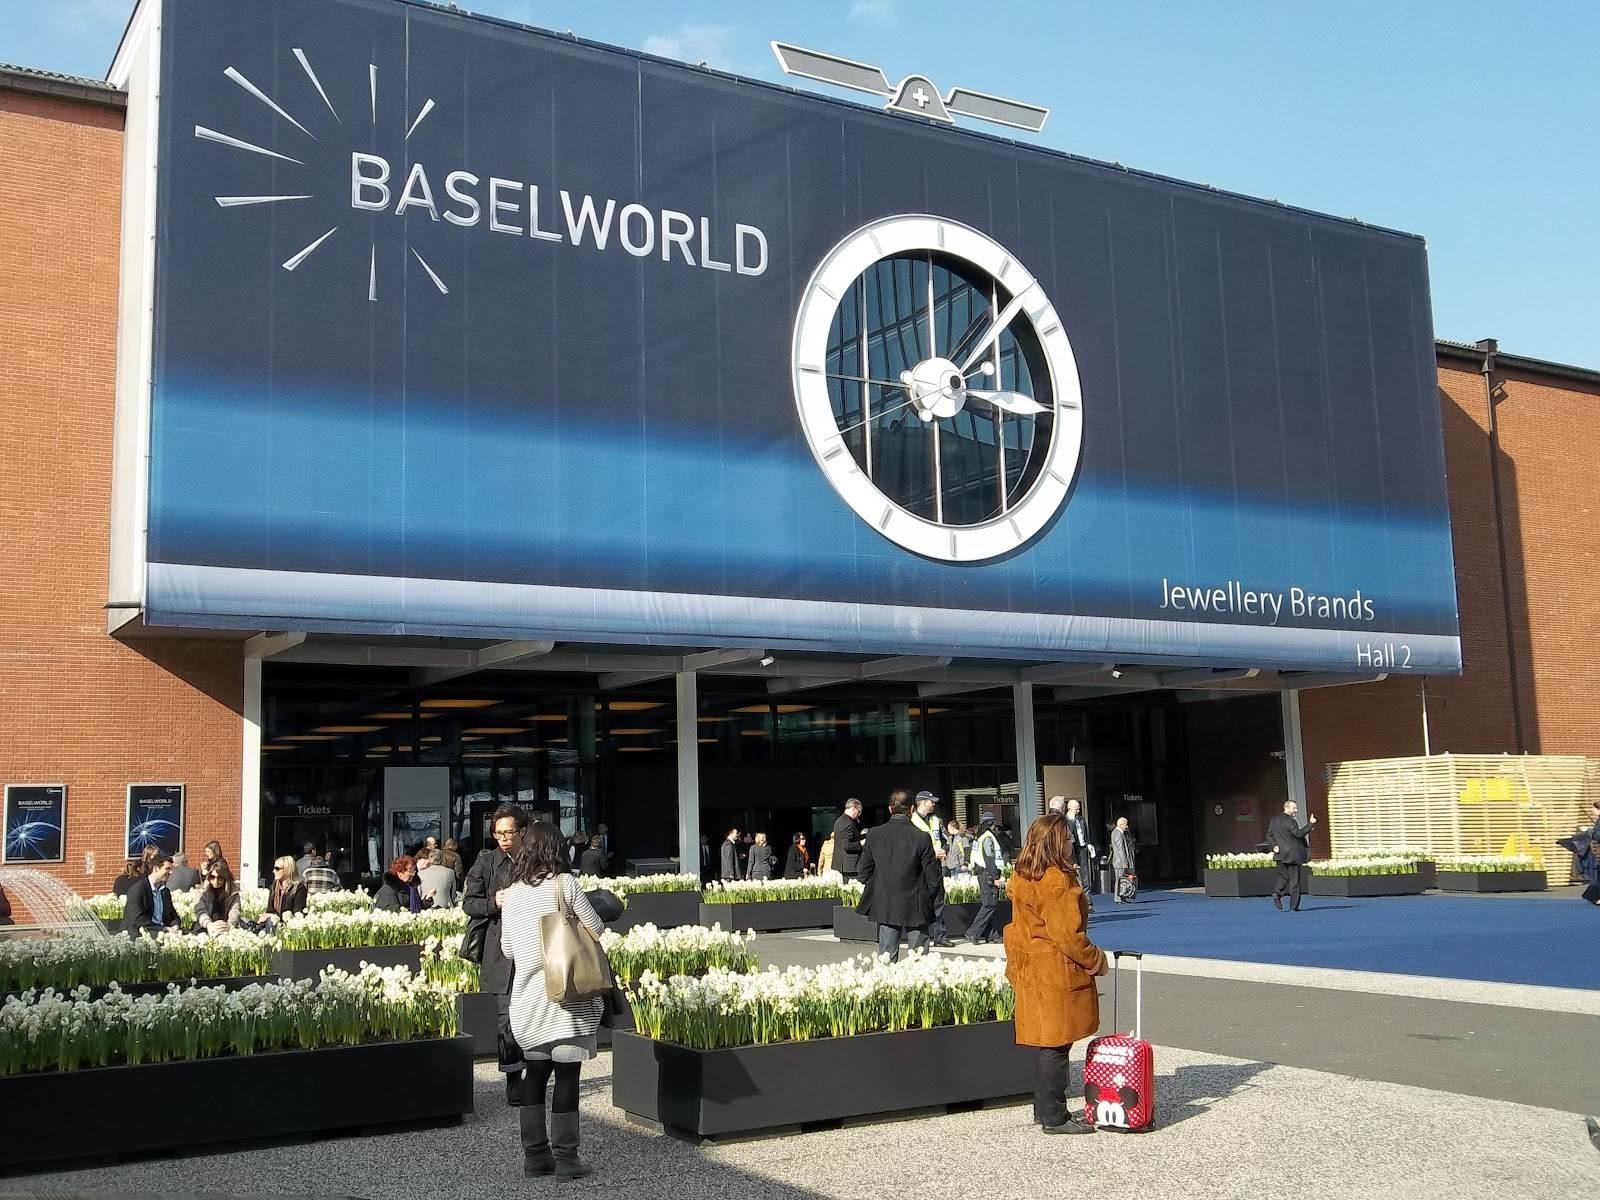 MHC_Baselworld_Gebäude.jpg